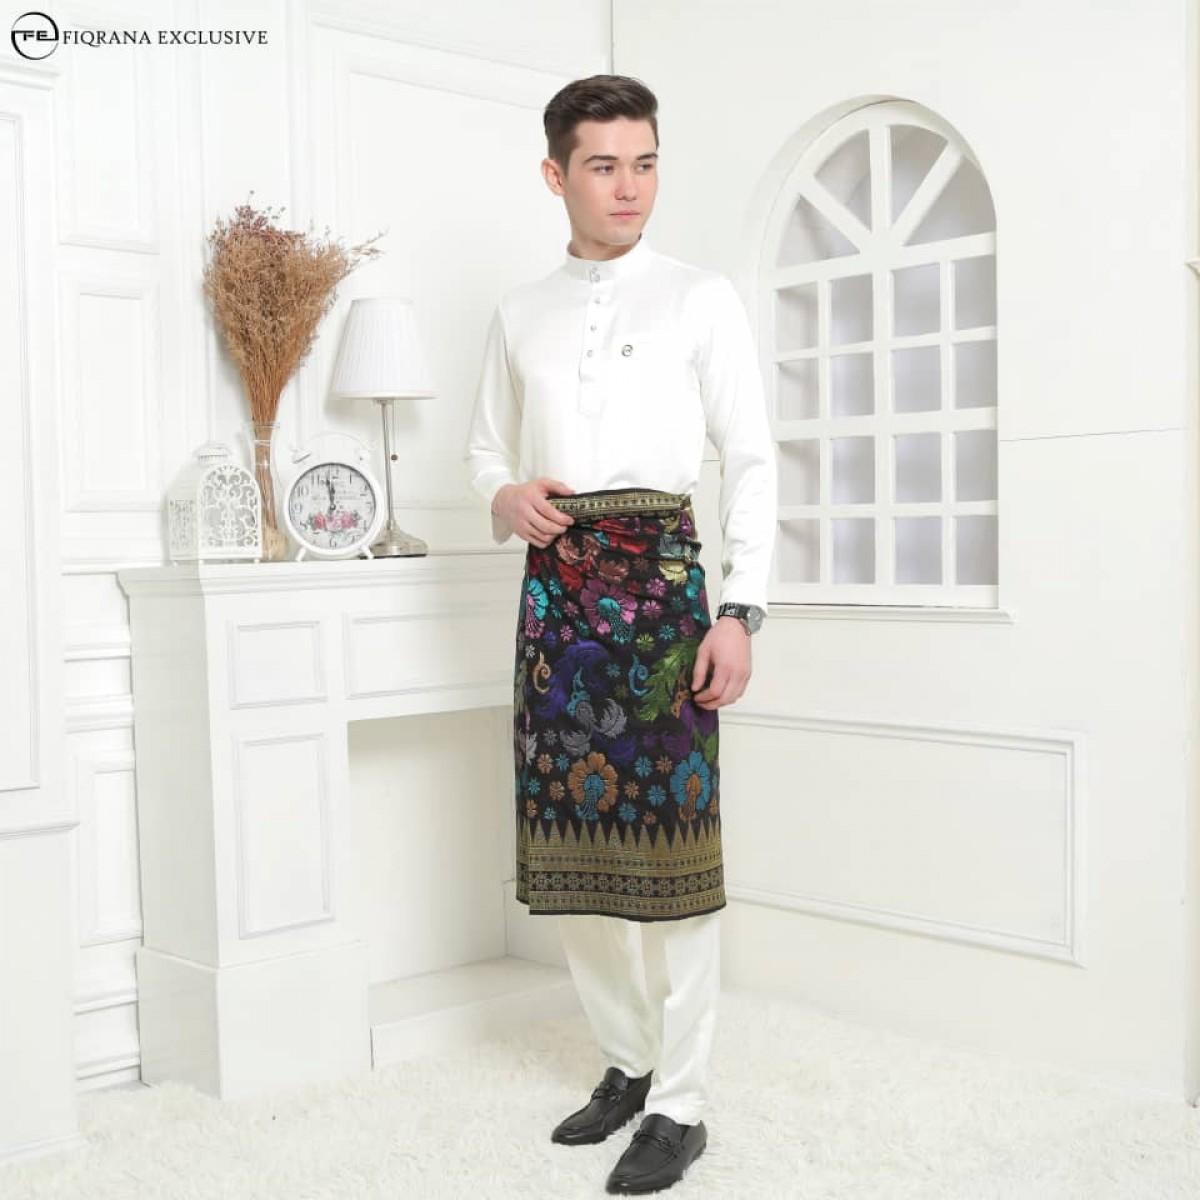 Baju Melayu Slimfit Offwhite - Fiqrana Exclusive